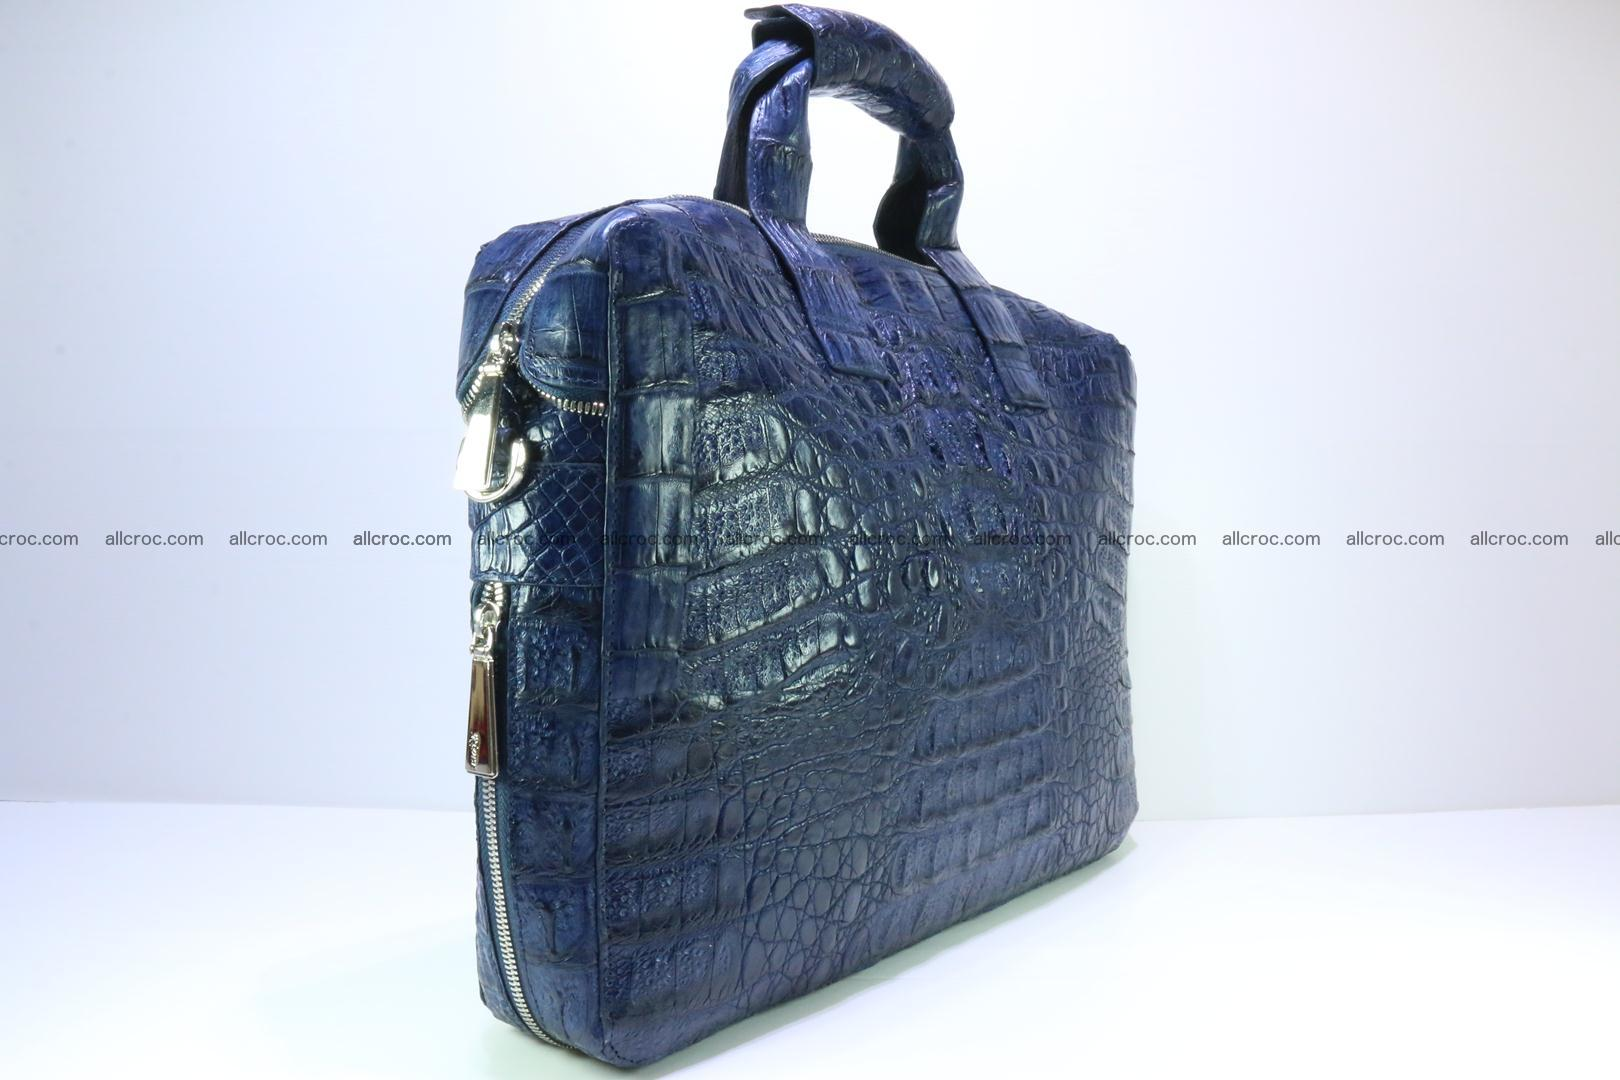 Crocodile skin handbag 423 Foto 1